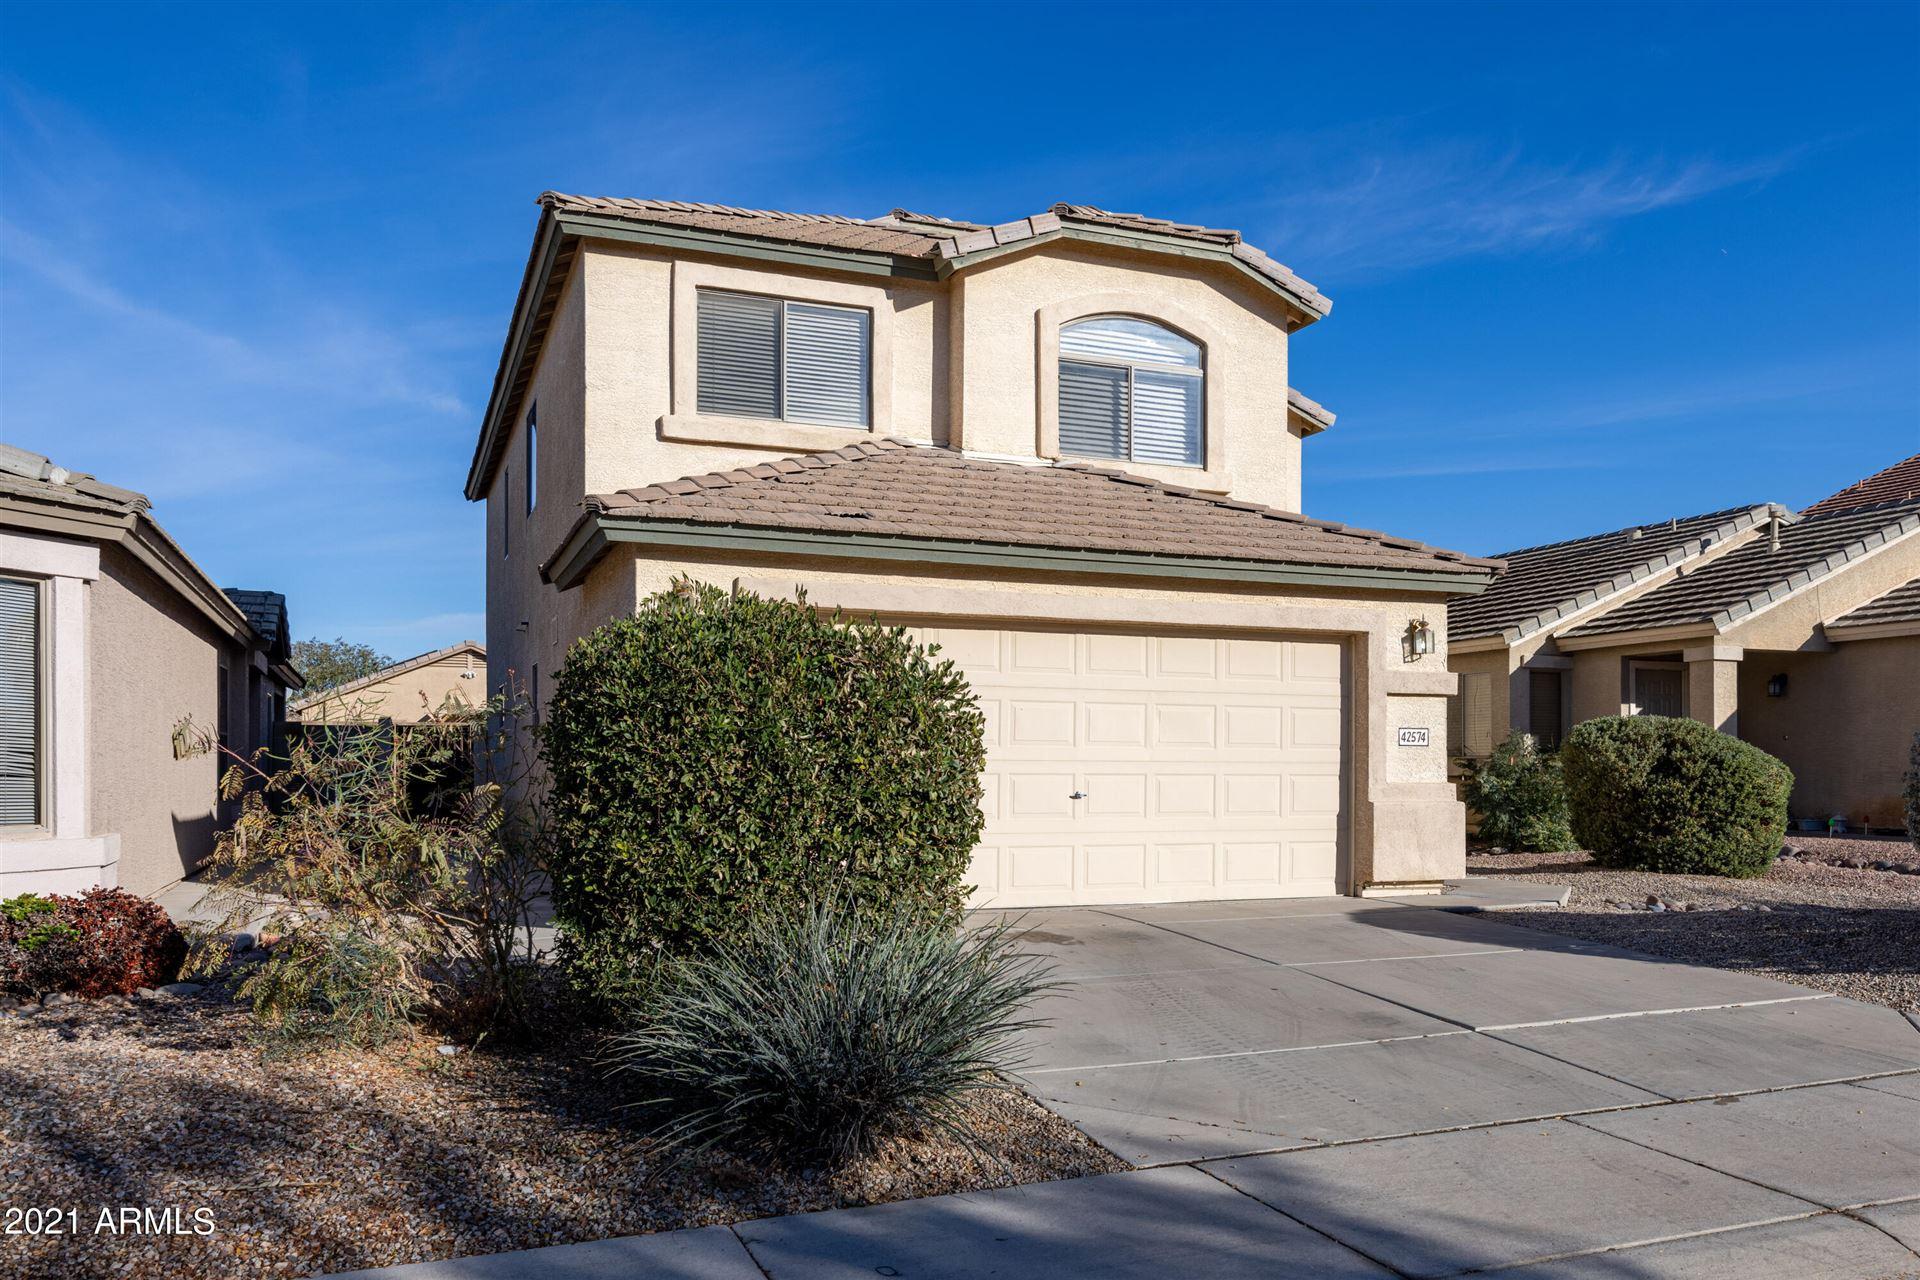 Photo of 42574 W SUNLAND Drive, Maricopa, AZ 85138 (MLS # 6307275)